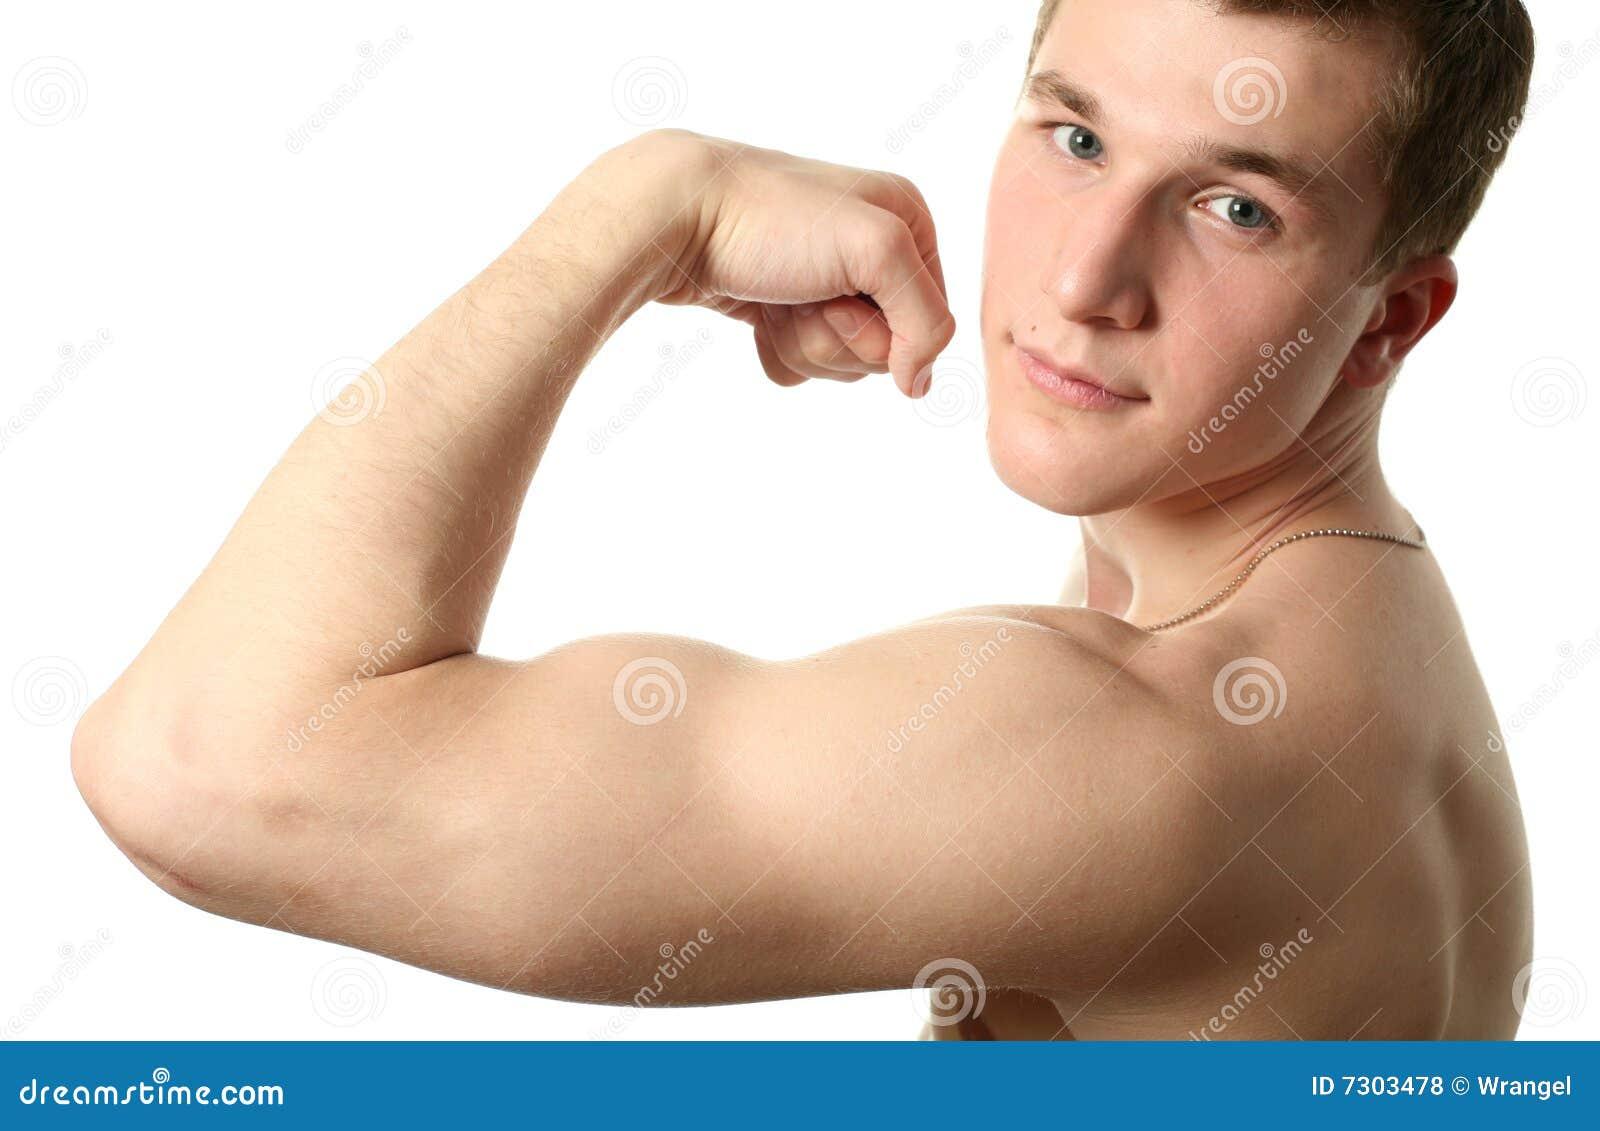 Men flexing biceps